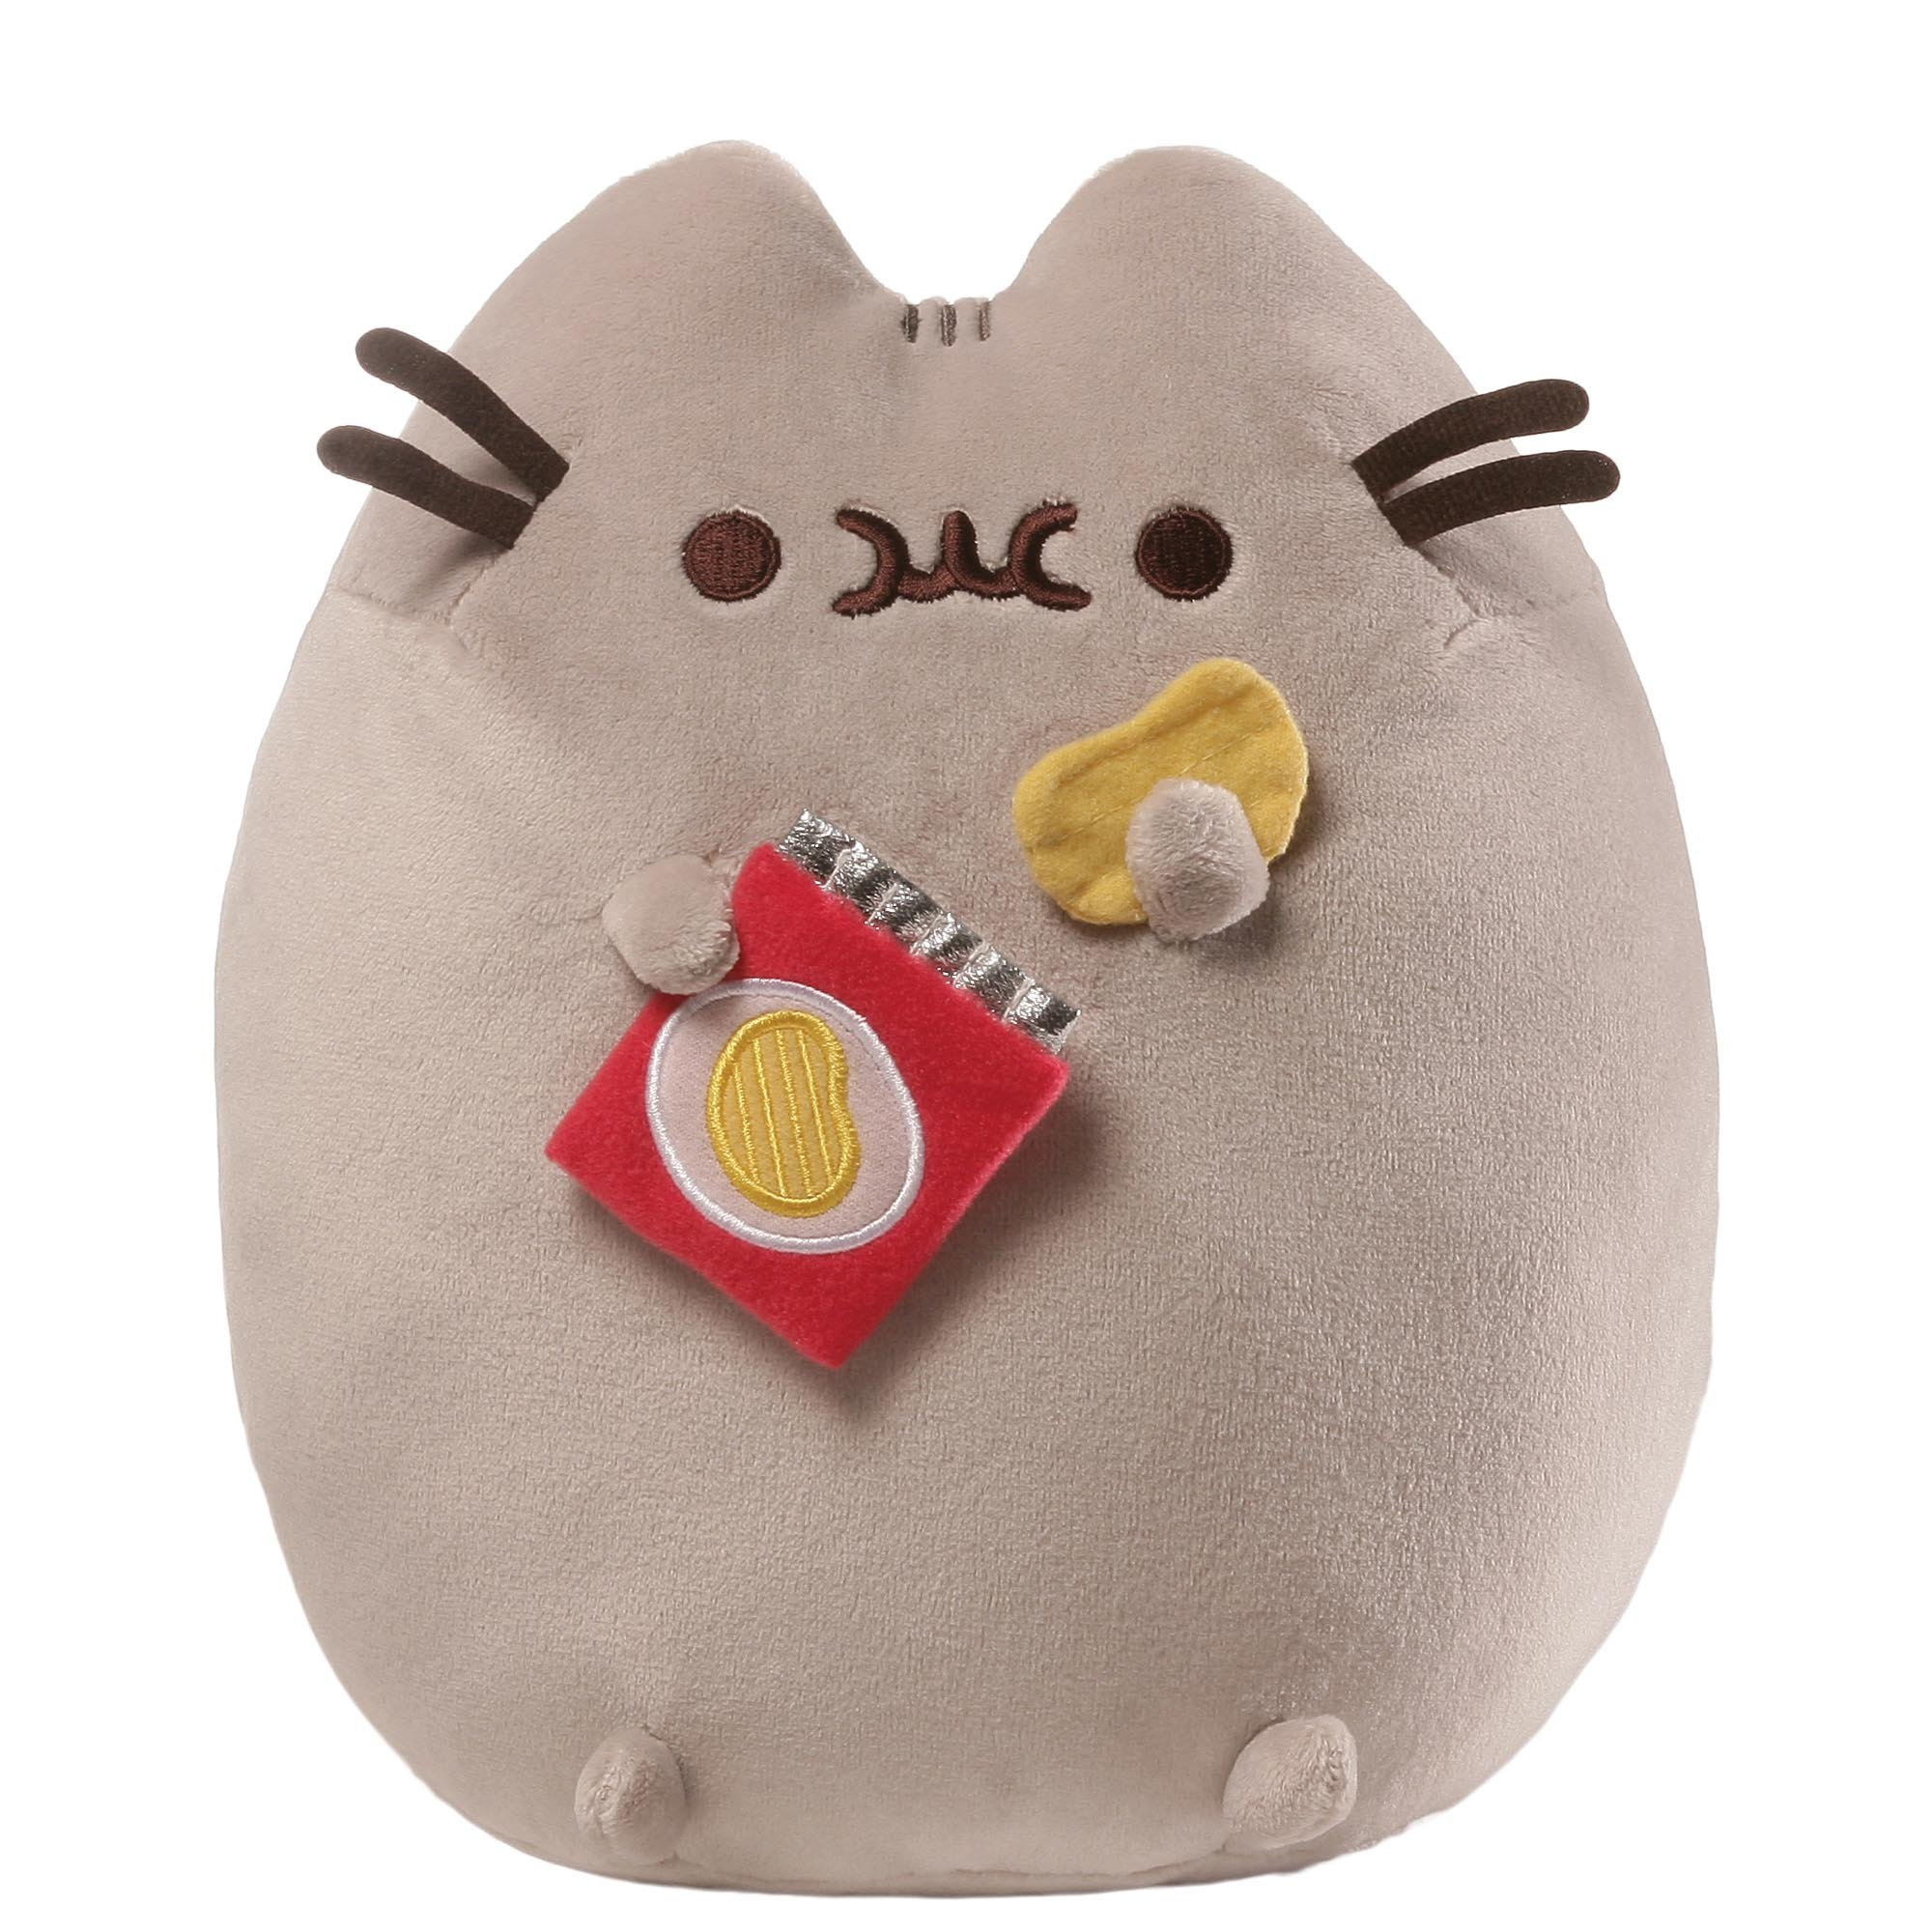 GUND Pusheen Snackables Potato Chip Cat Plush Stuffed Animal, Gray, 9.5'' by GUND